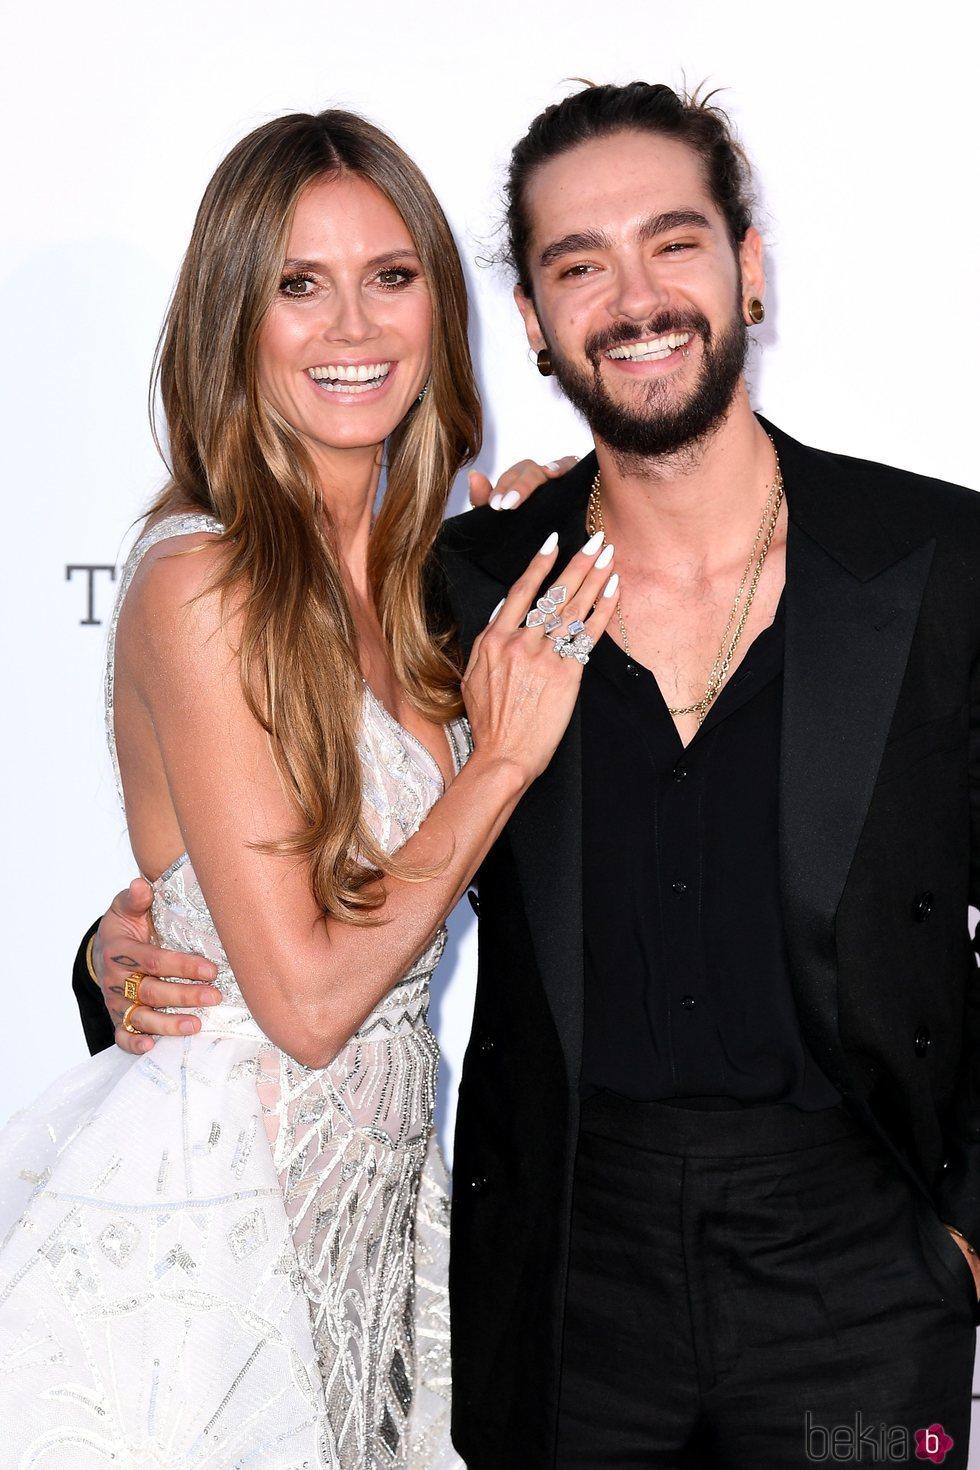 Heidi Klum y Tom Kaulitz en el Festival de Cannes 2018